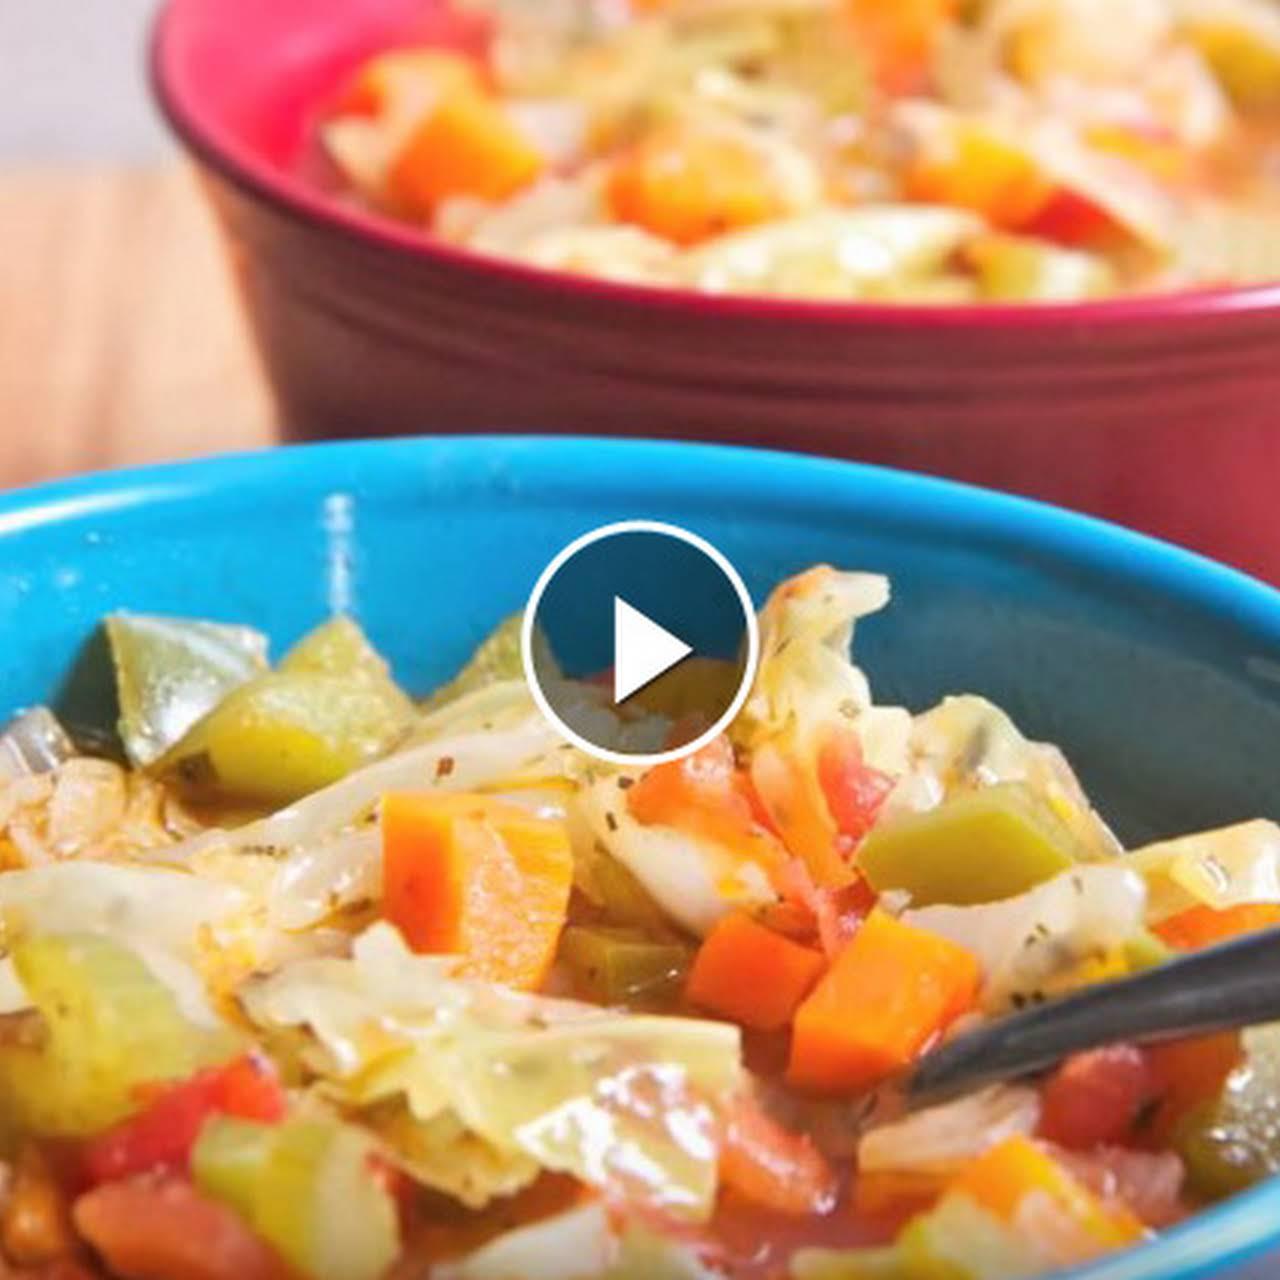 10 lbs In 1 Week Cabbage Soup Diet Recipe AKA  surprise Soup